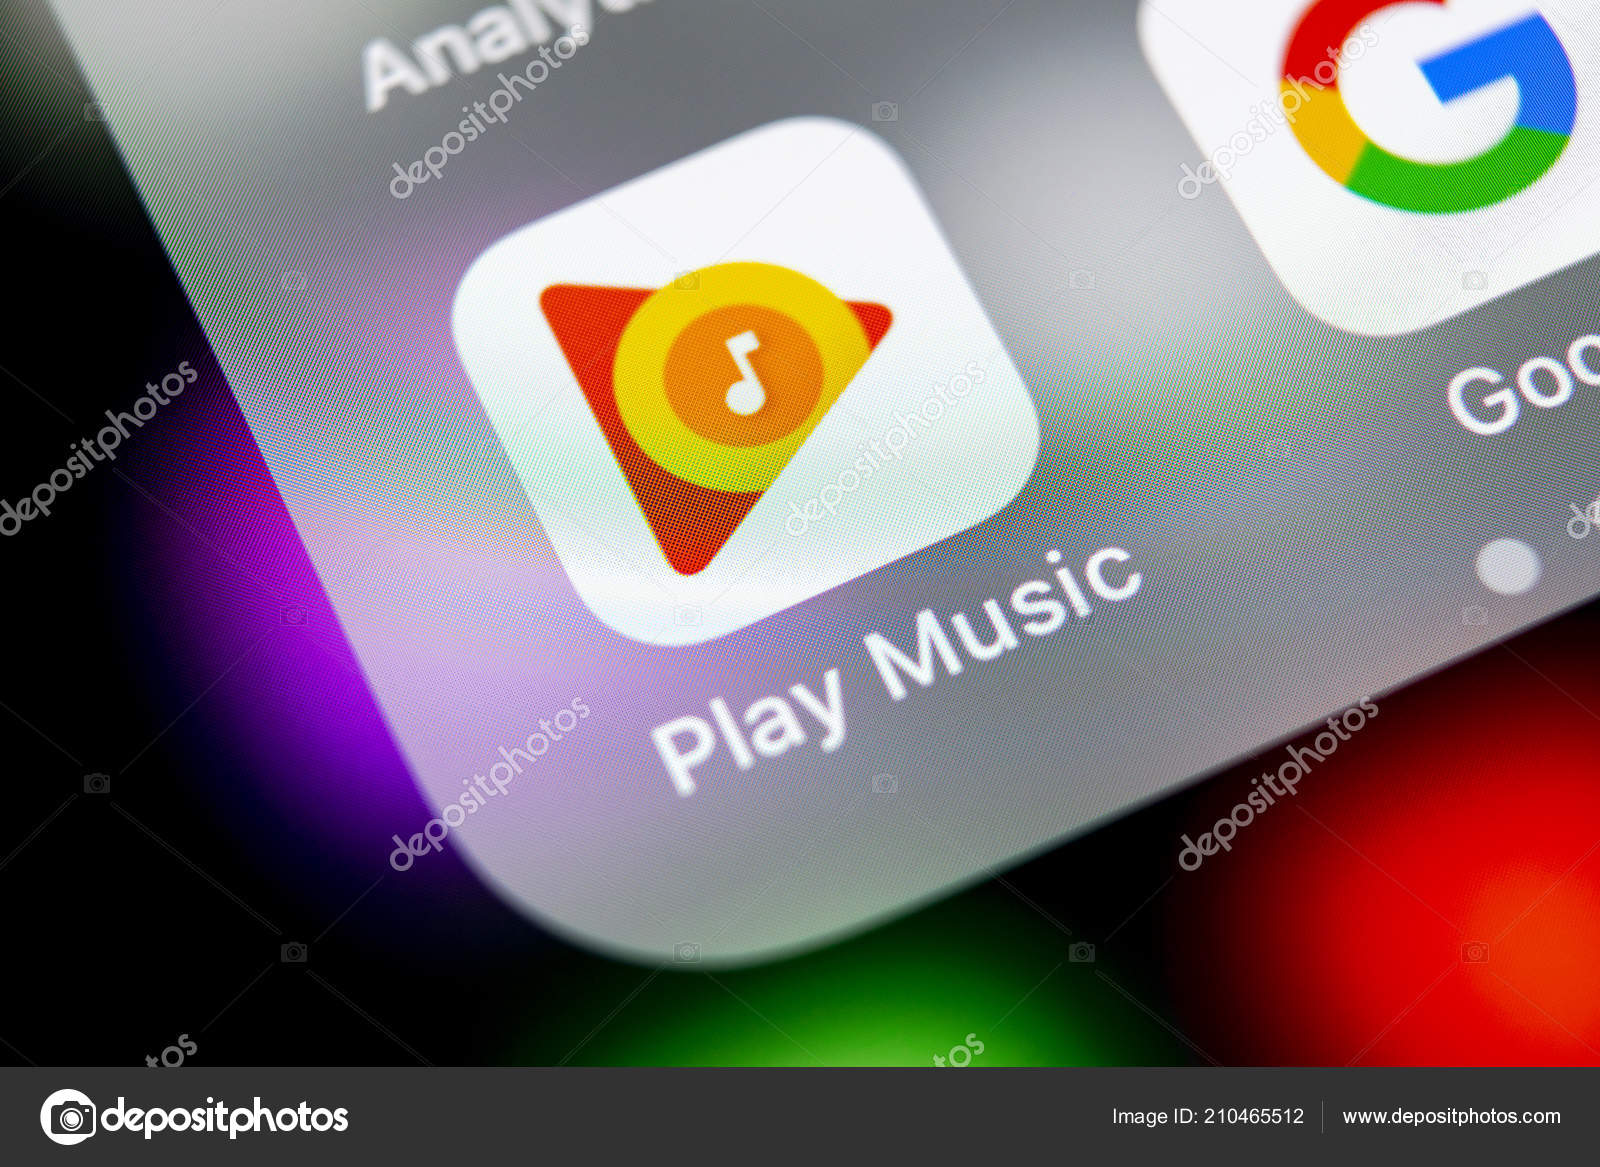 Sankt Petersburg Russia August 2018 Google Play Music Application